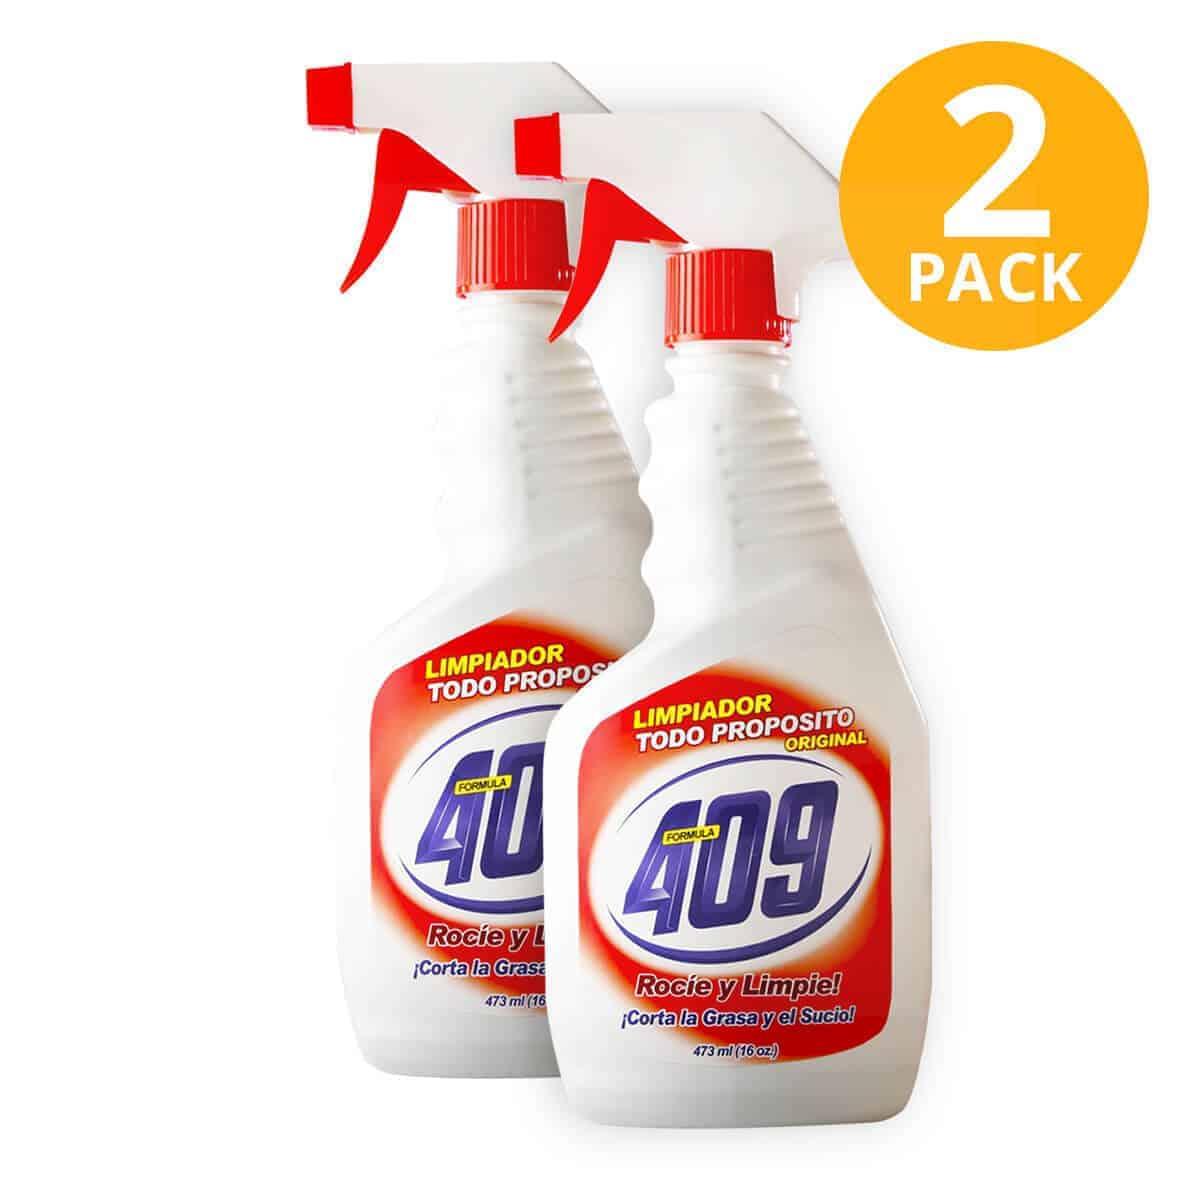 Limpiador 409 Regular Todo Propósito, 32 OZ (Pack de 2)